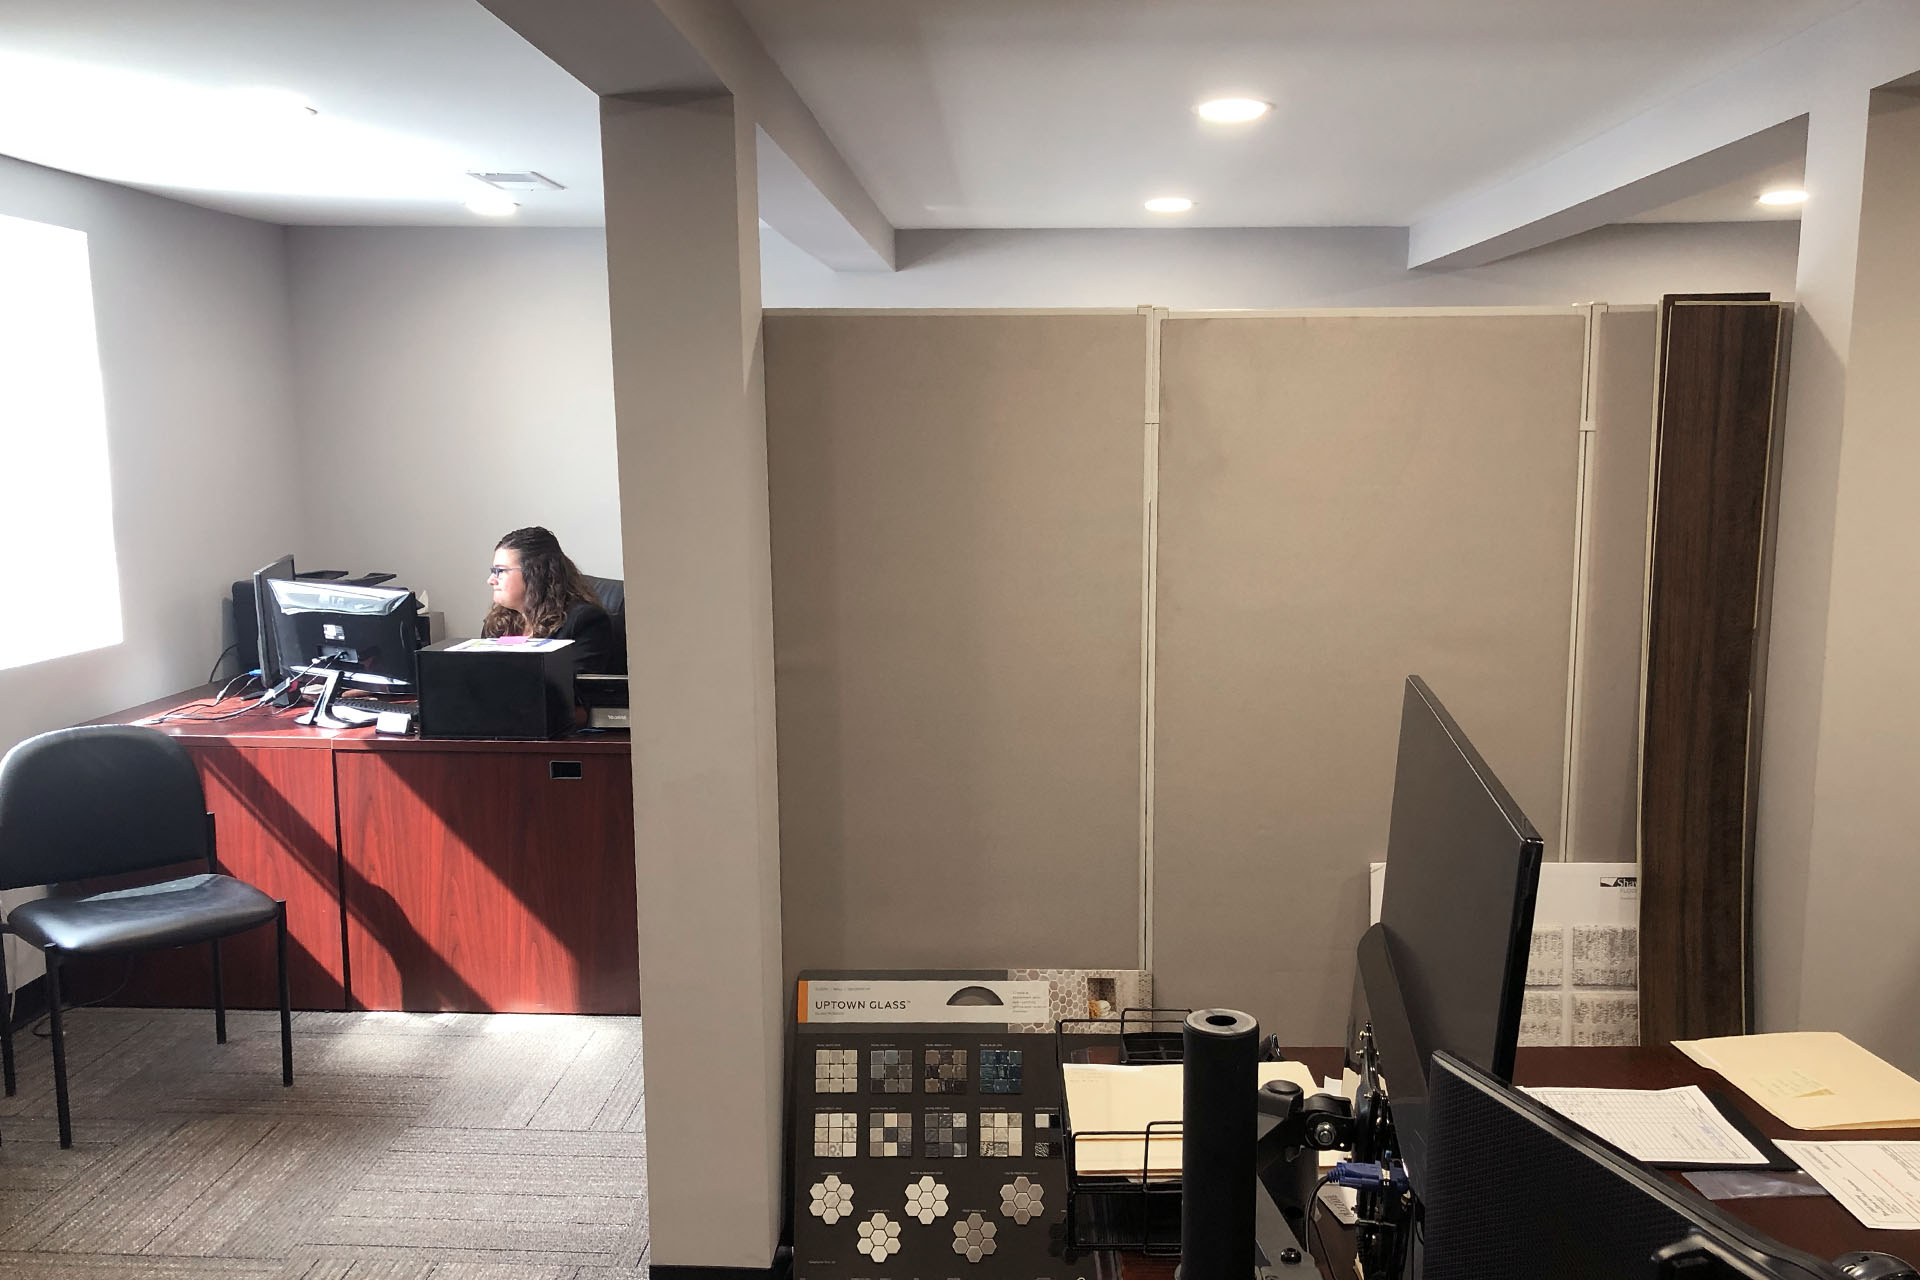 6688-2-after-office-sherri-march-2019-dandsflooring.jpg